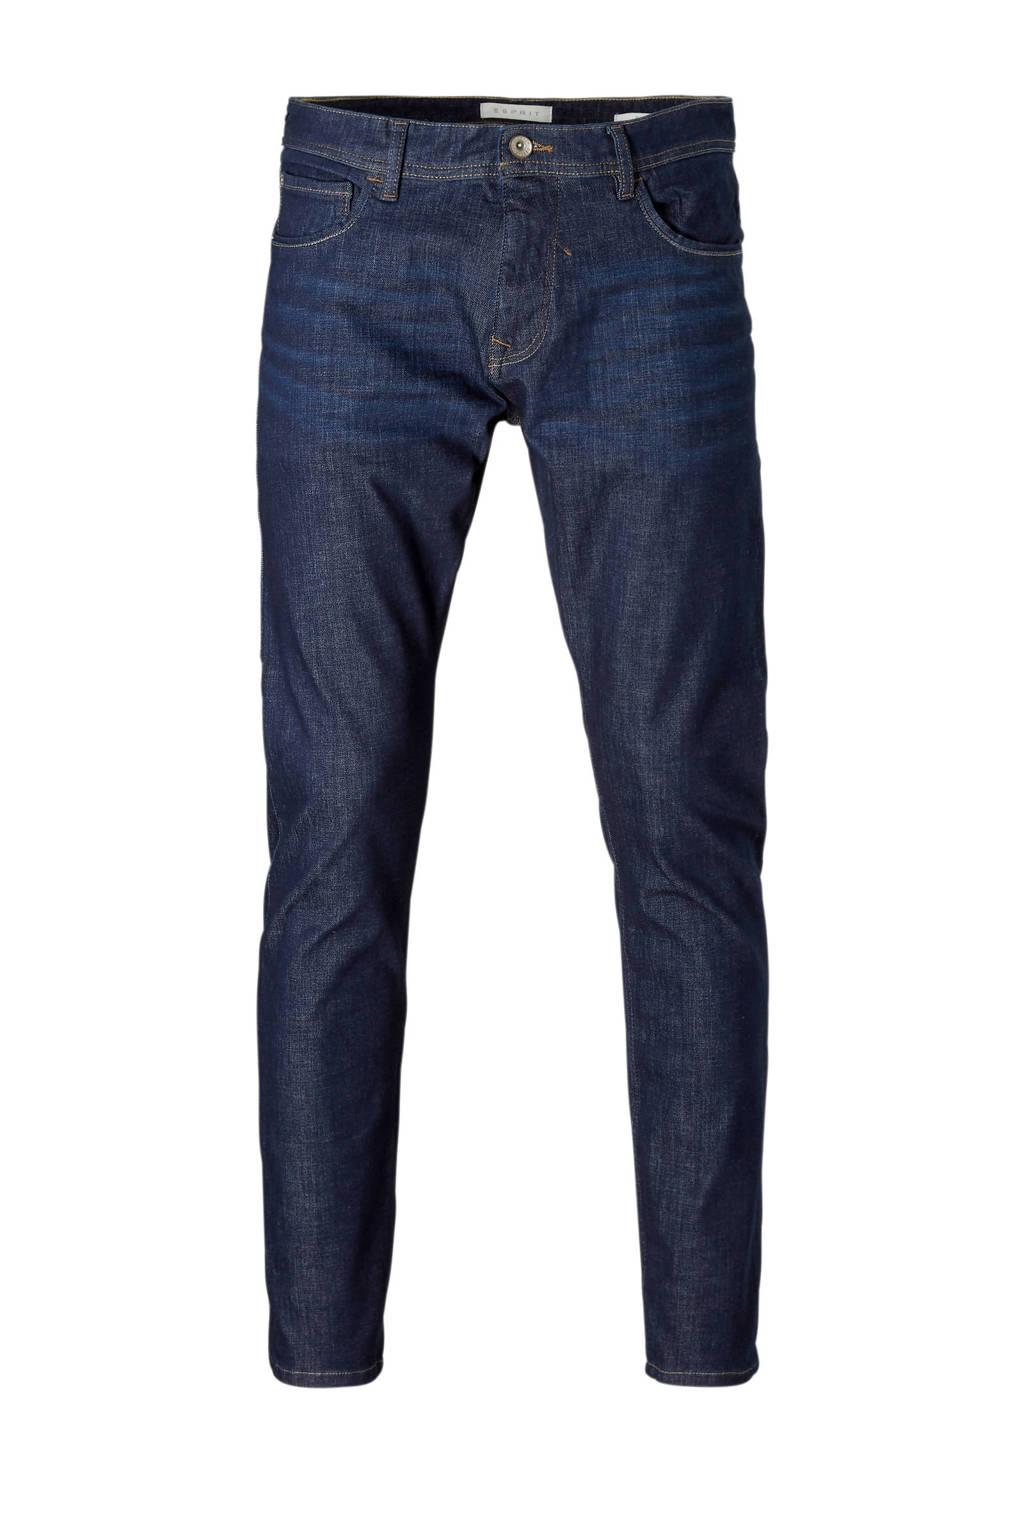 ESPRIT Men Casual jeans slim fit, Dark denim